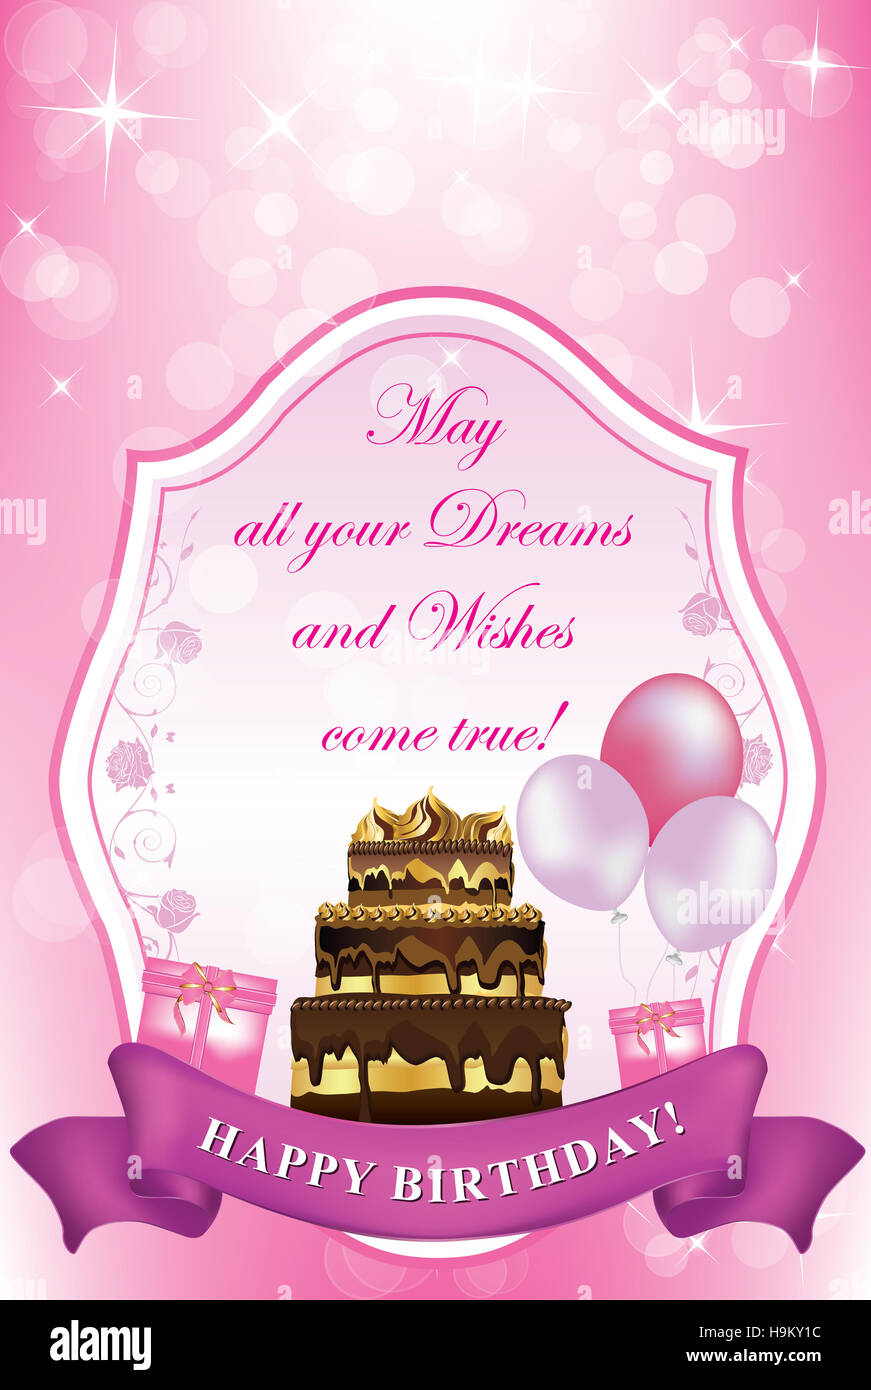 Happy Birthday Purple Pink Printable Greeting Card For Birthday